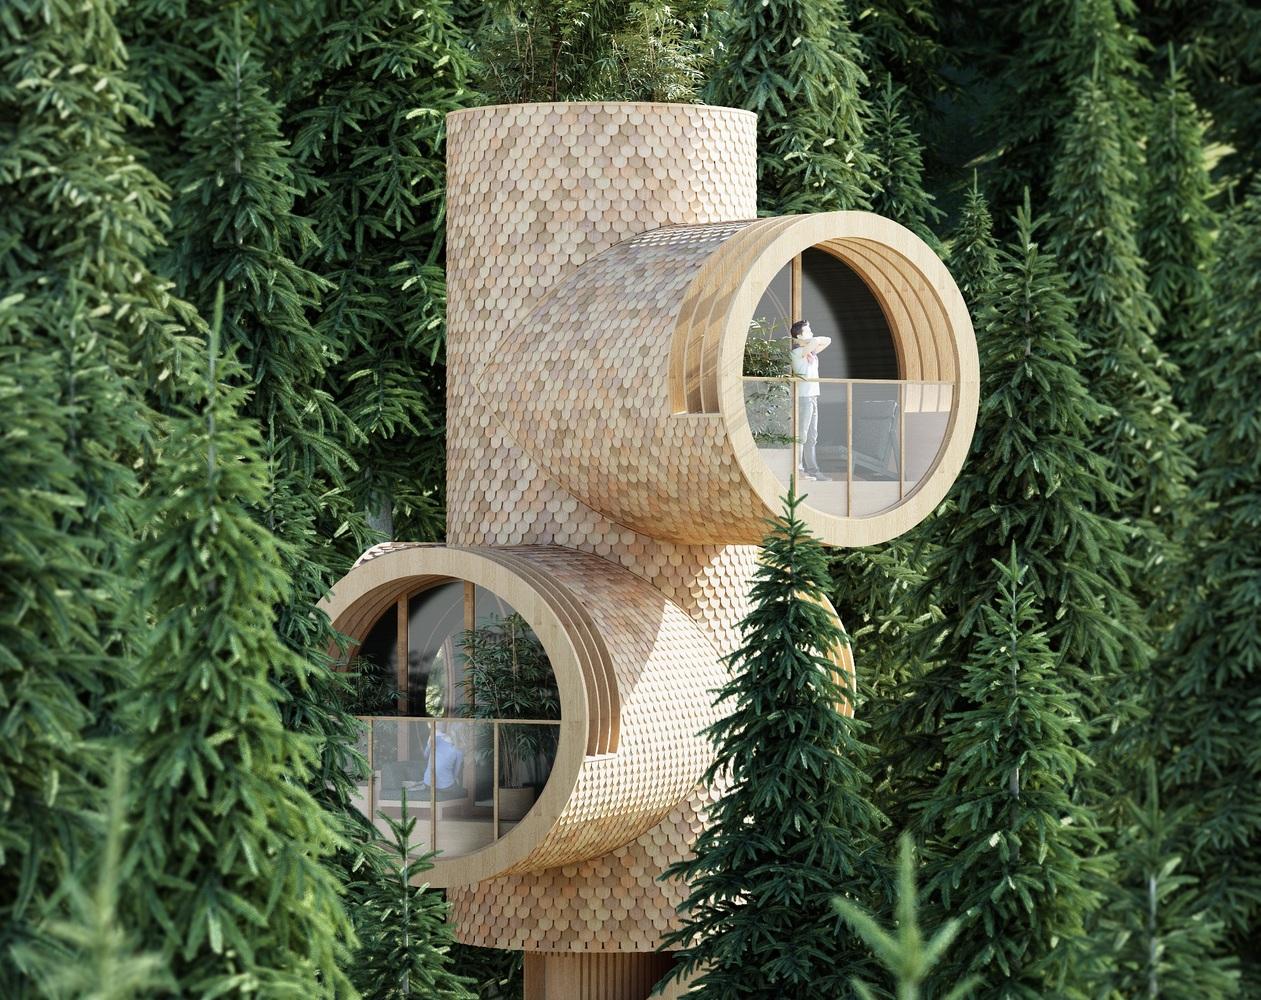 Prefab treehouses look like periscopes peeking through the forest